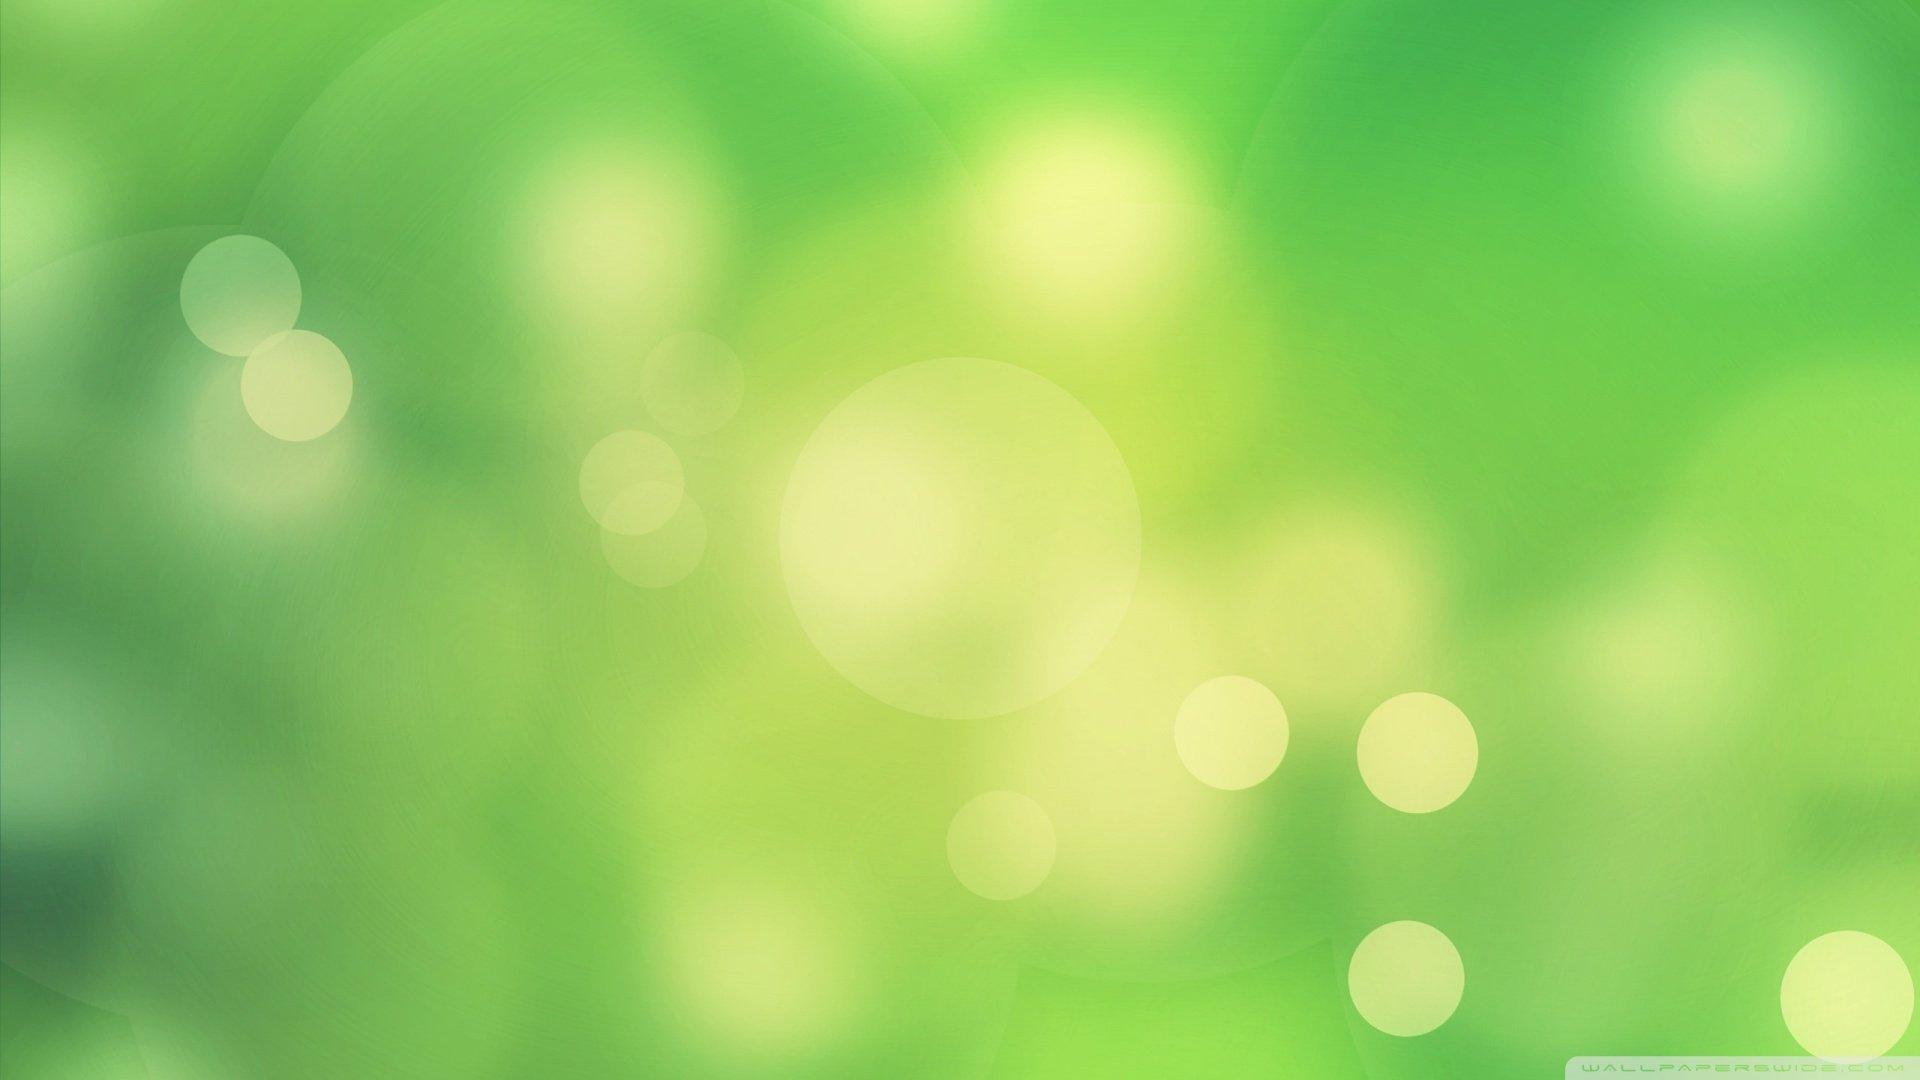 Green Background 2 Wallpaper 1920x1080 Green Background 2 1920x1080